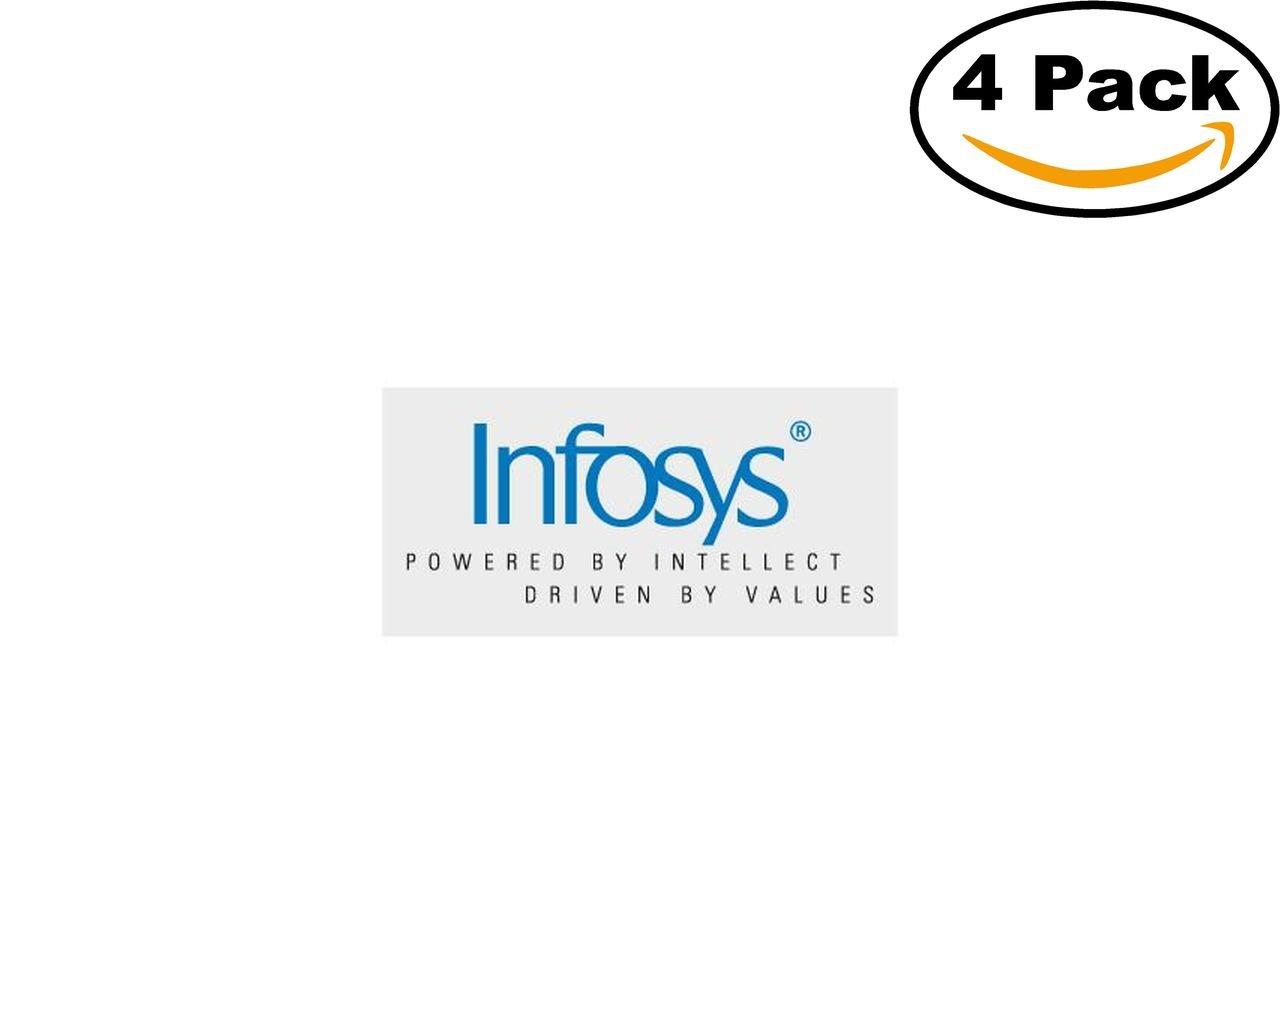 Amazon Infosys 4 Stickers 4x4 Inches Car Bumper Window Sticker Decal